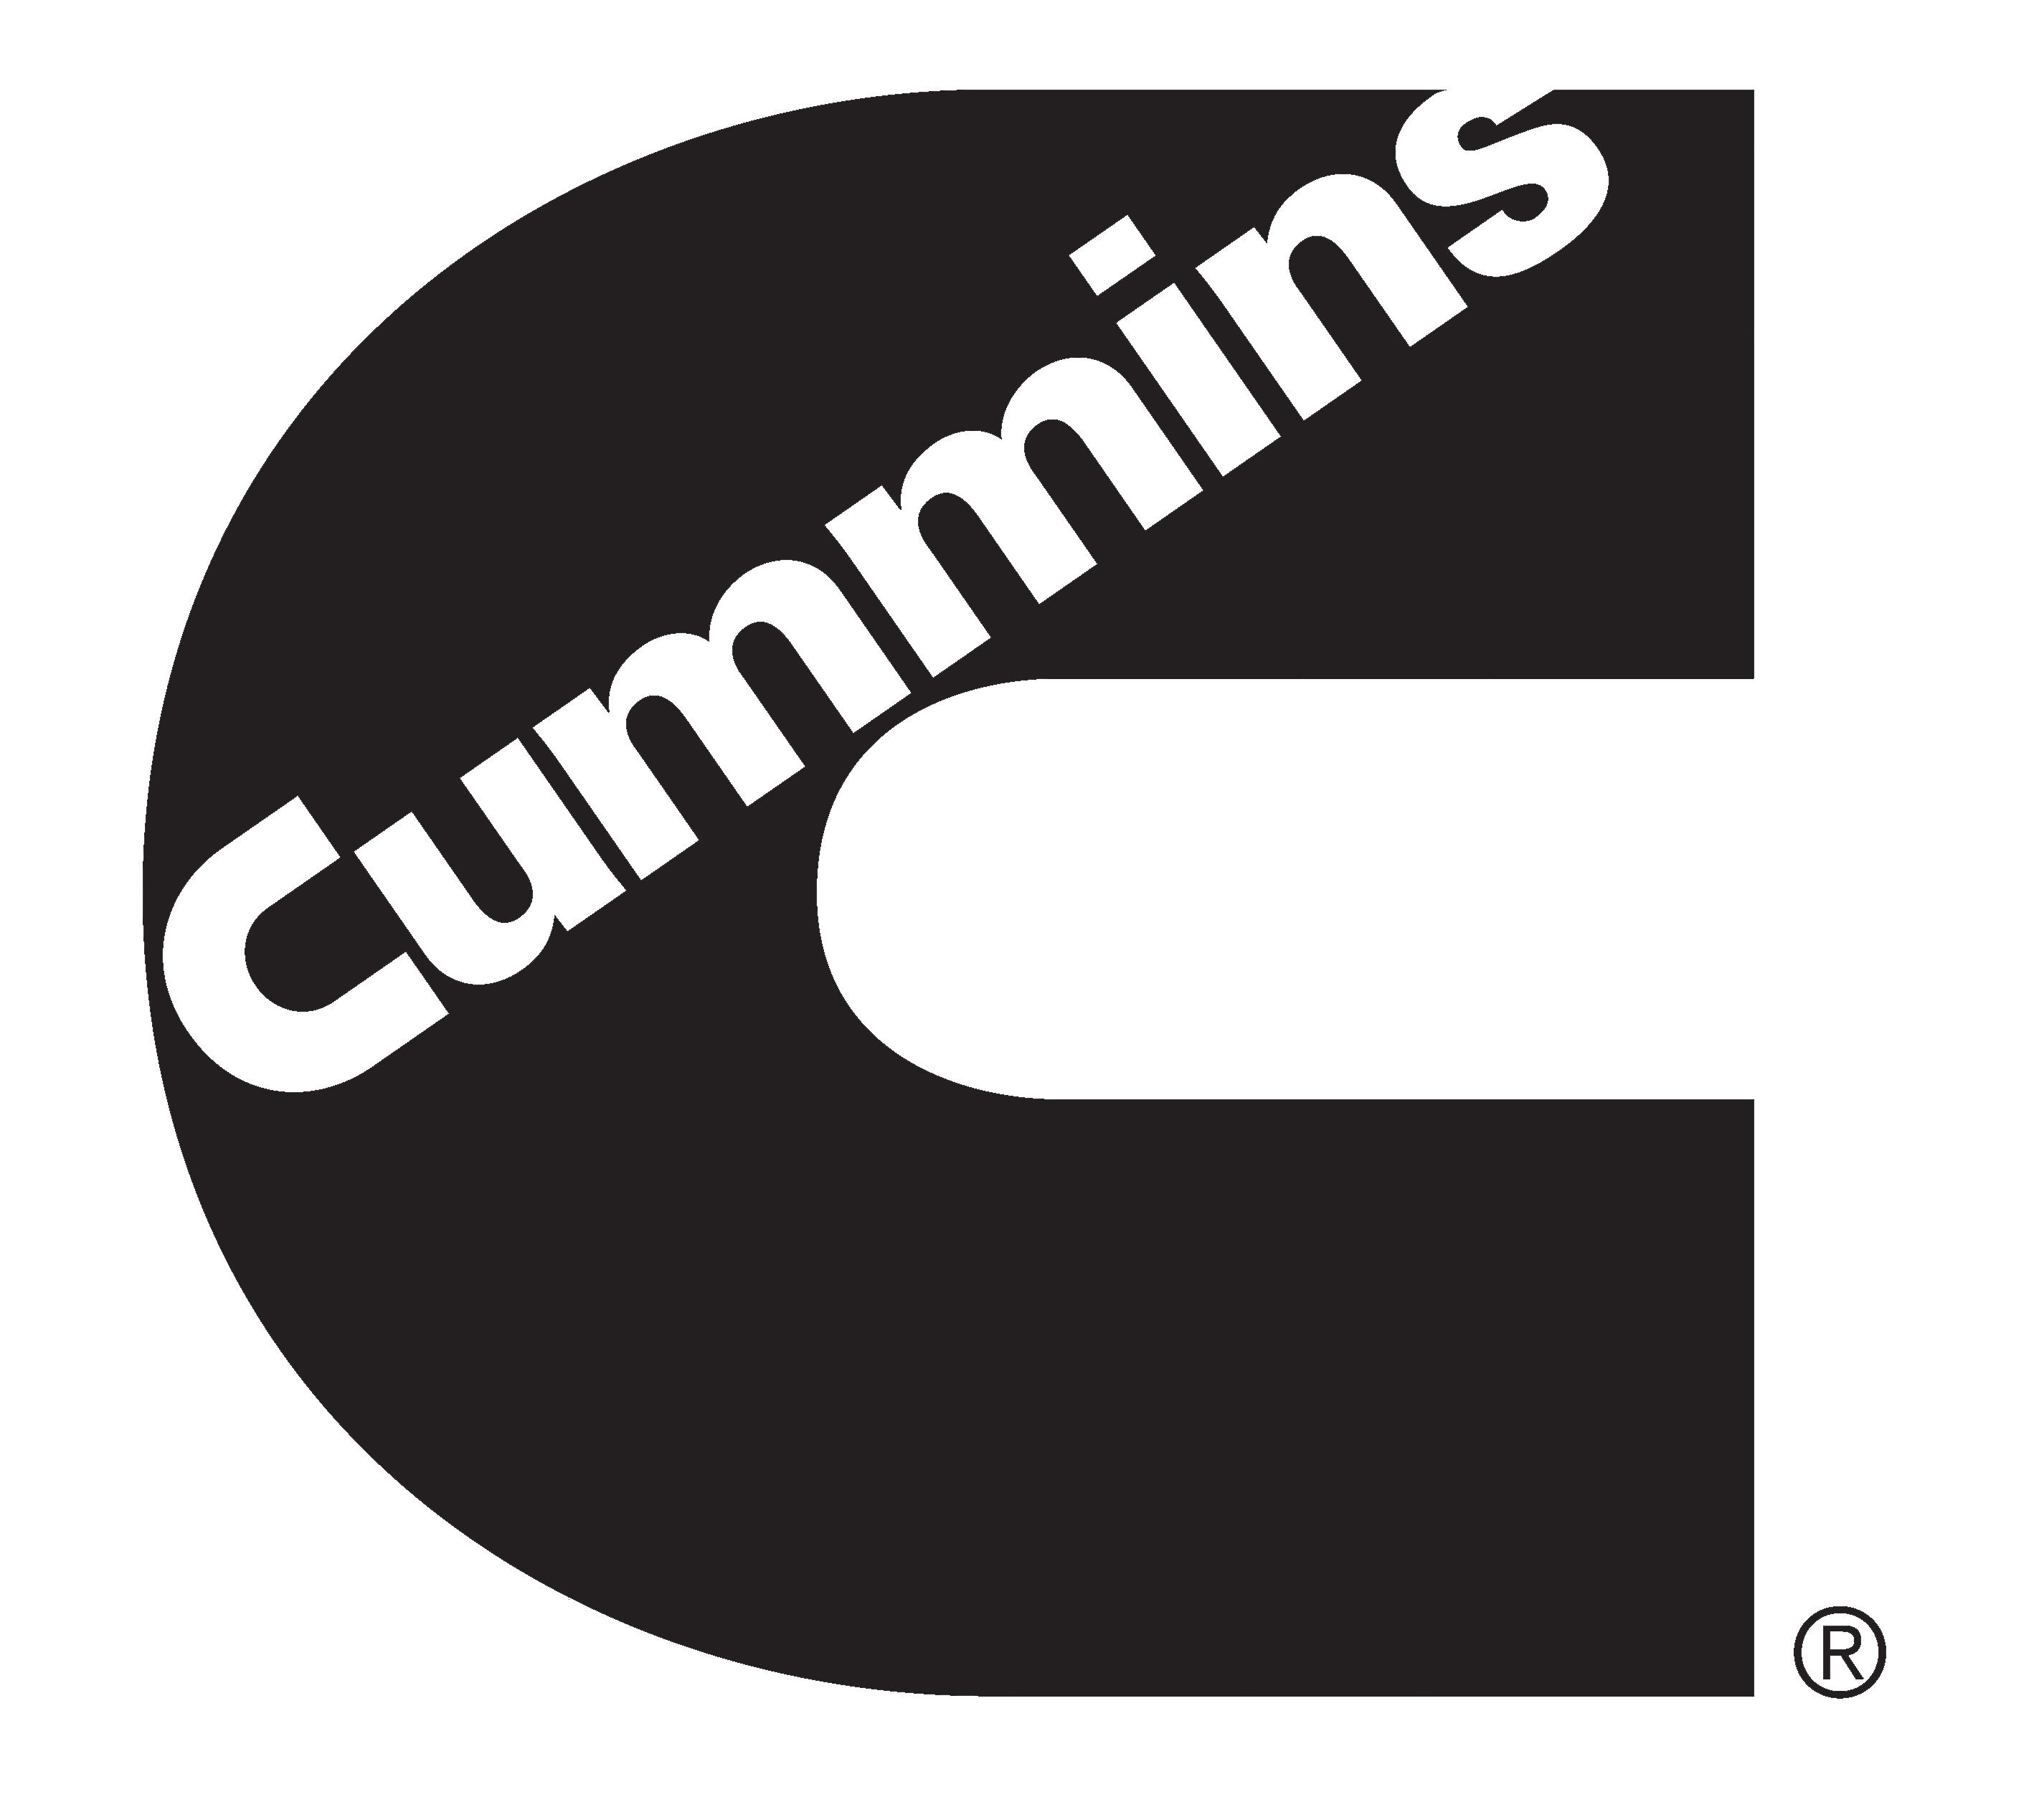 Cummins logo cummins symbol meaning history and evolution cummins logo buycottarizona Gallery